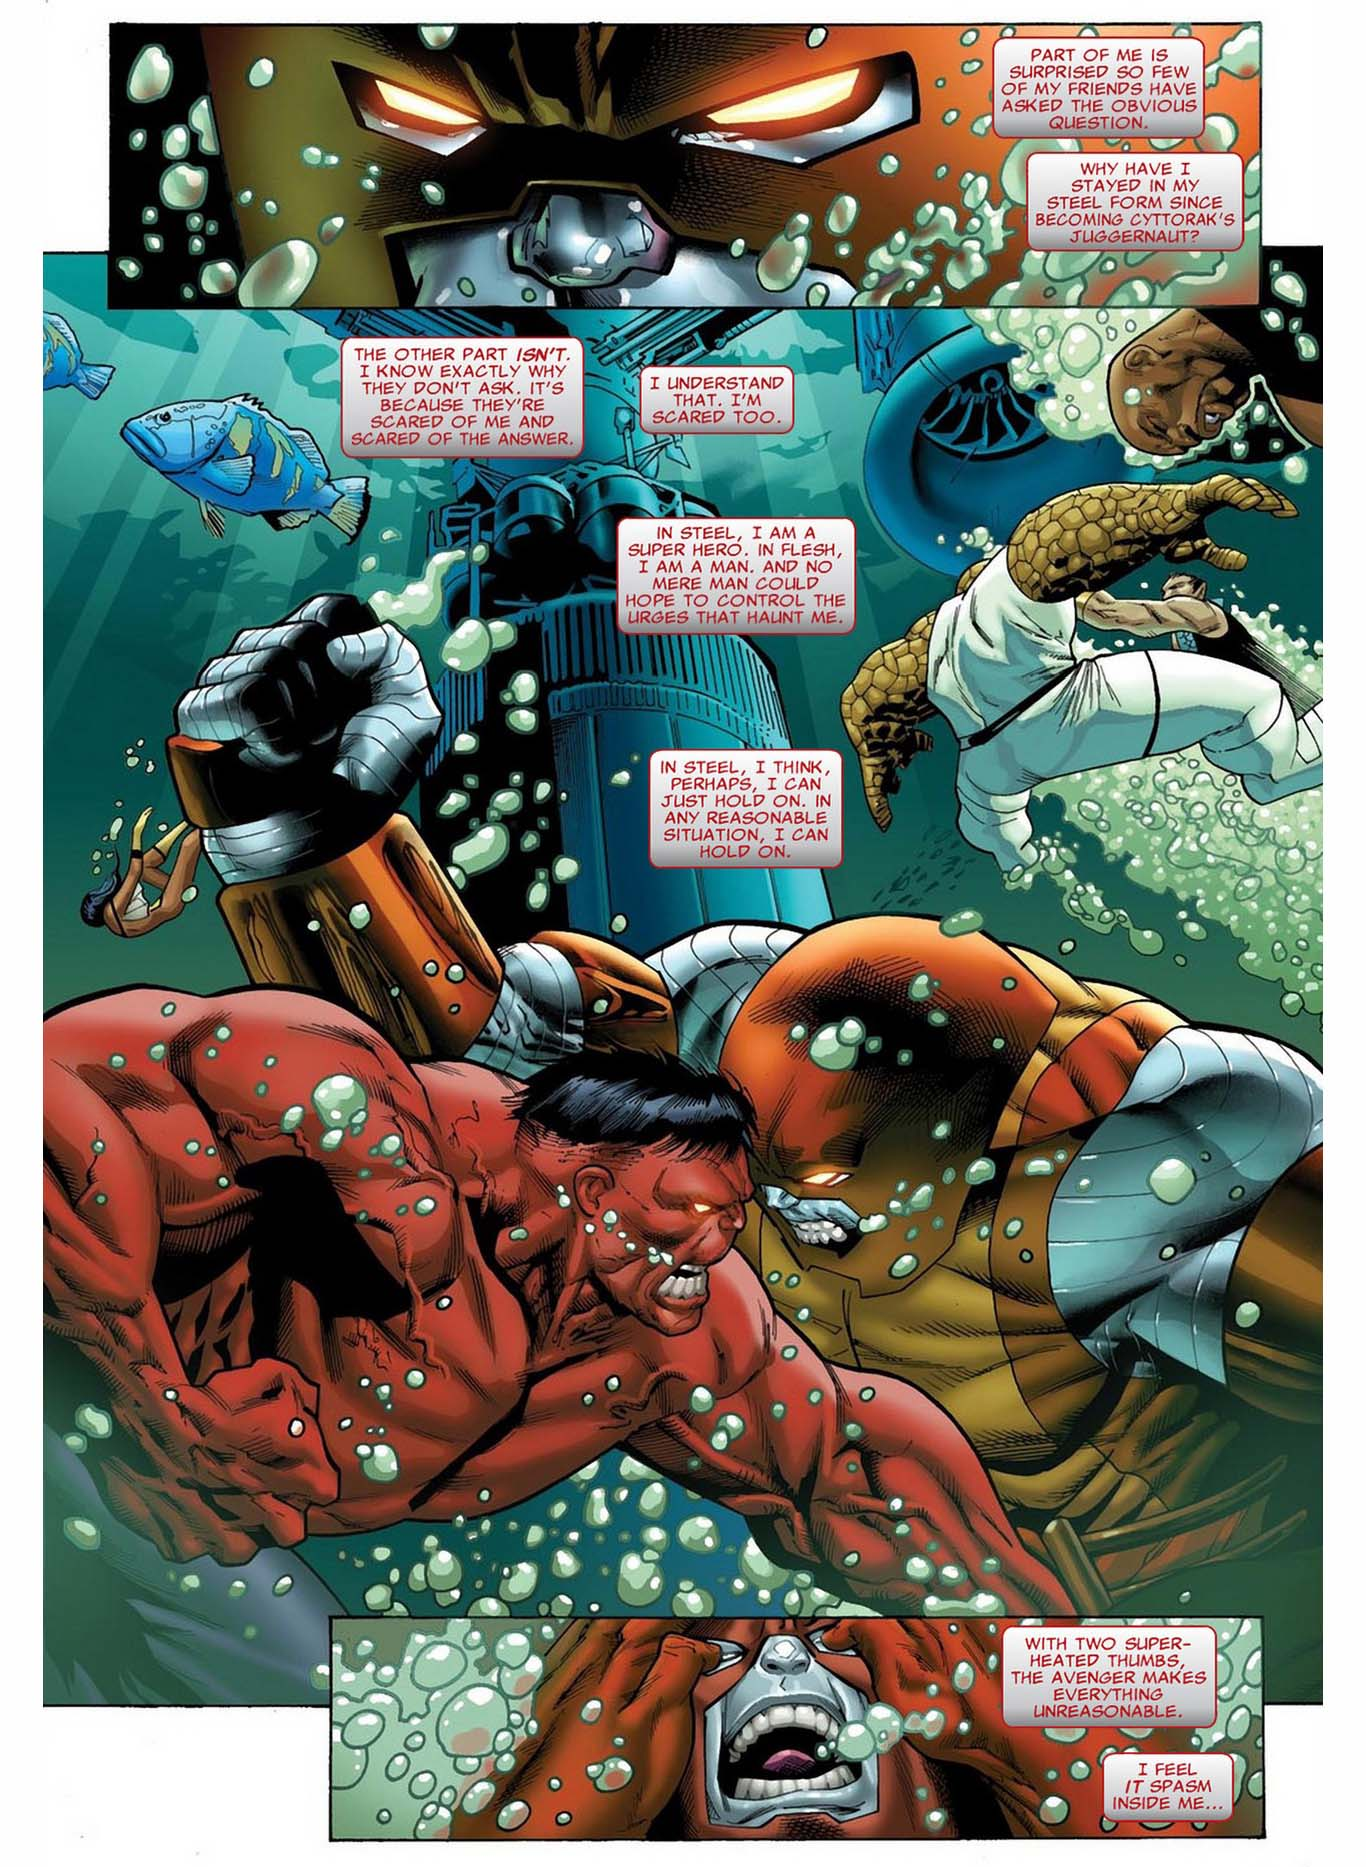 Red Hulk Makes Juggerlossus Angry Comicnewbies